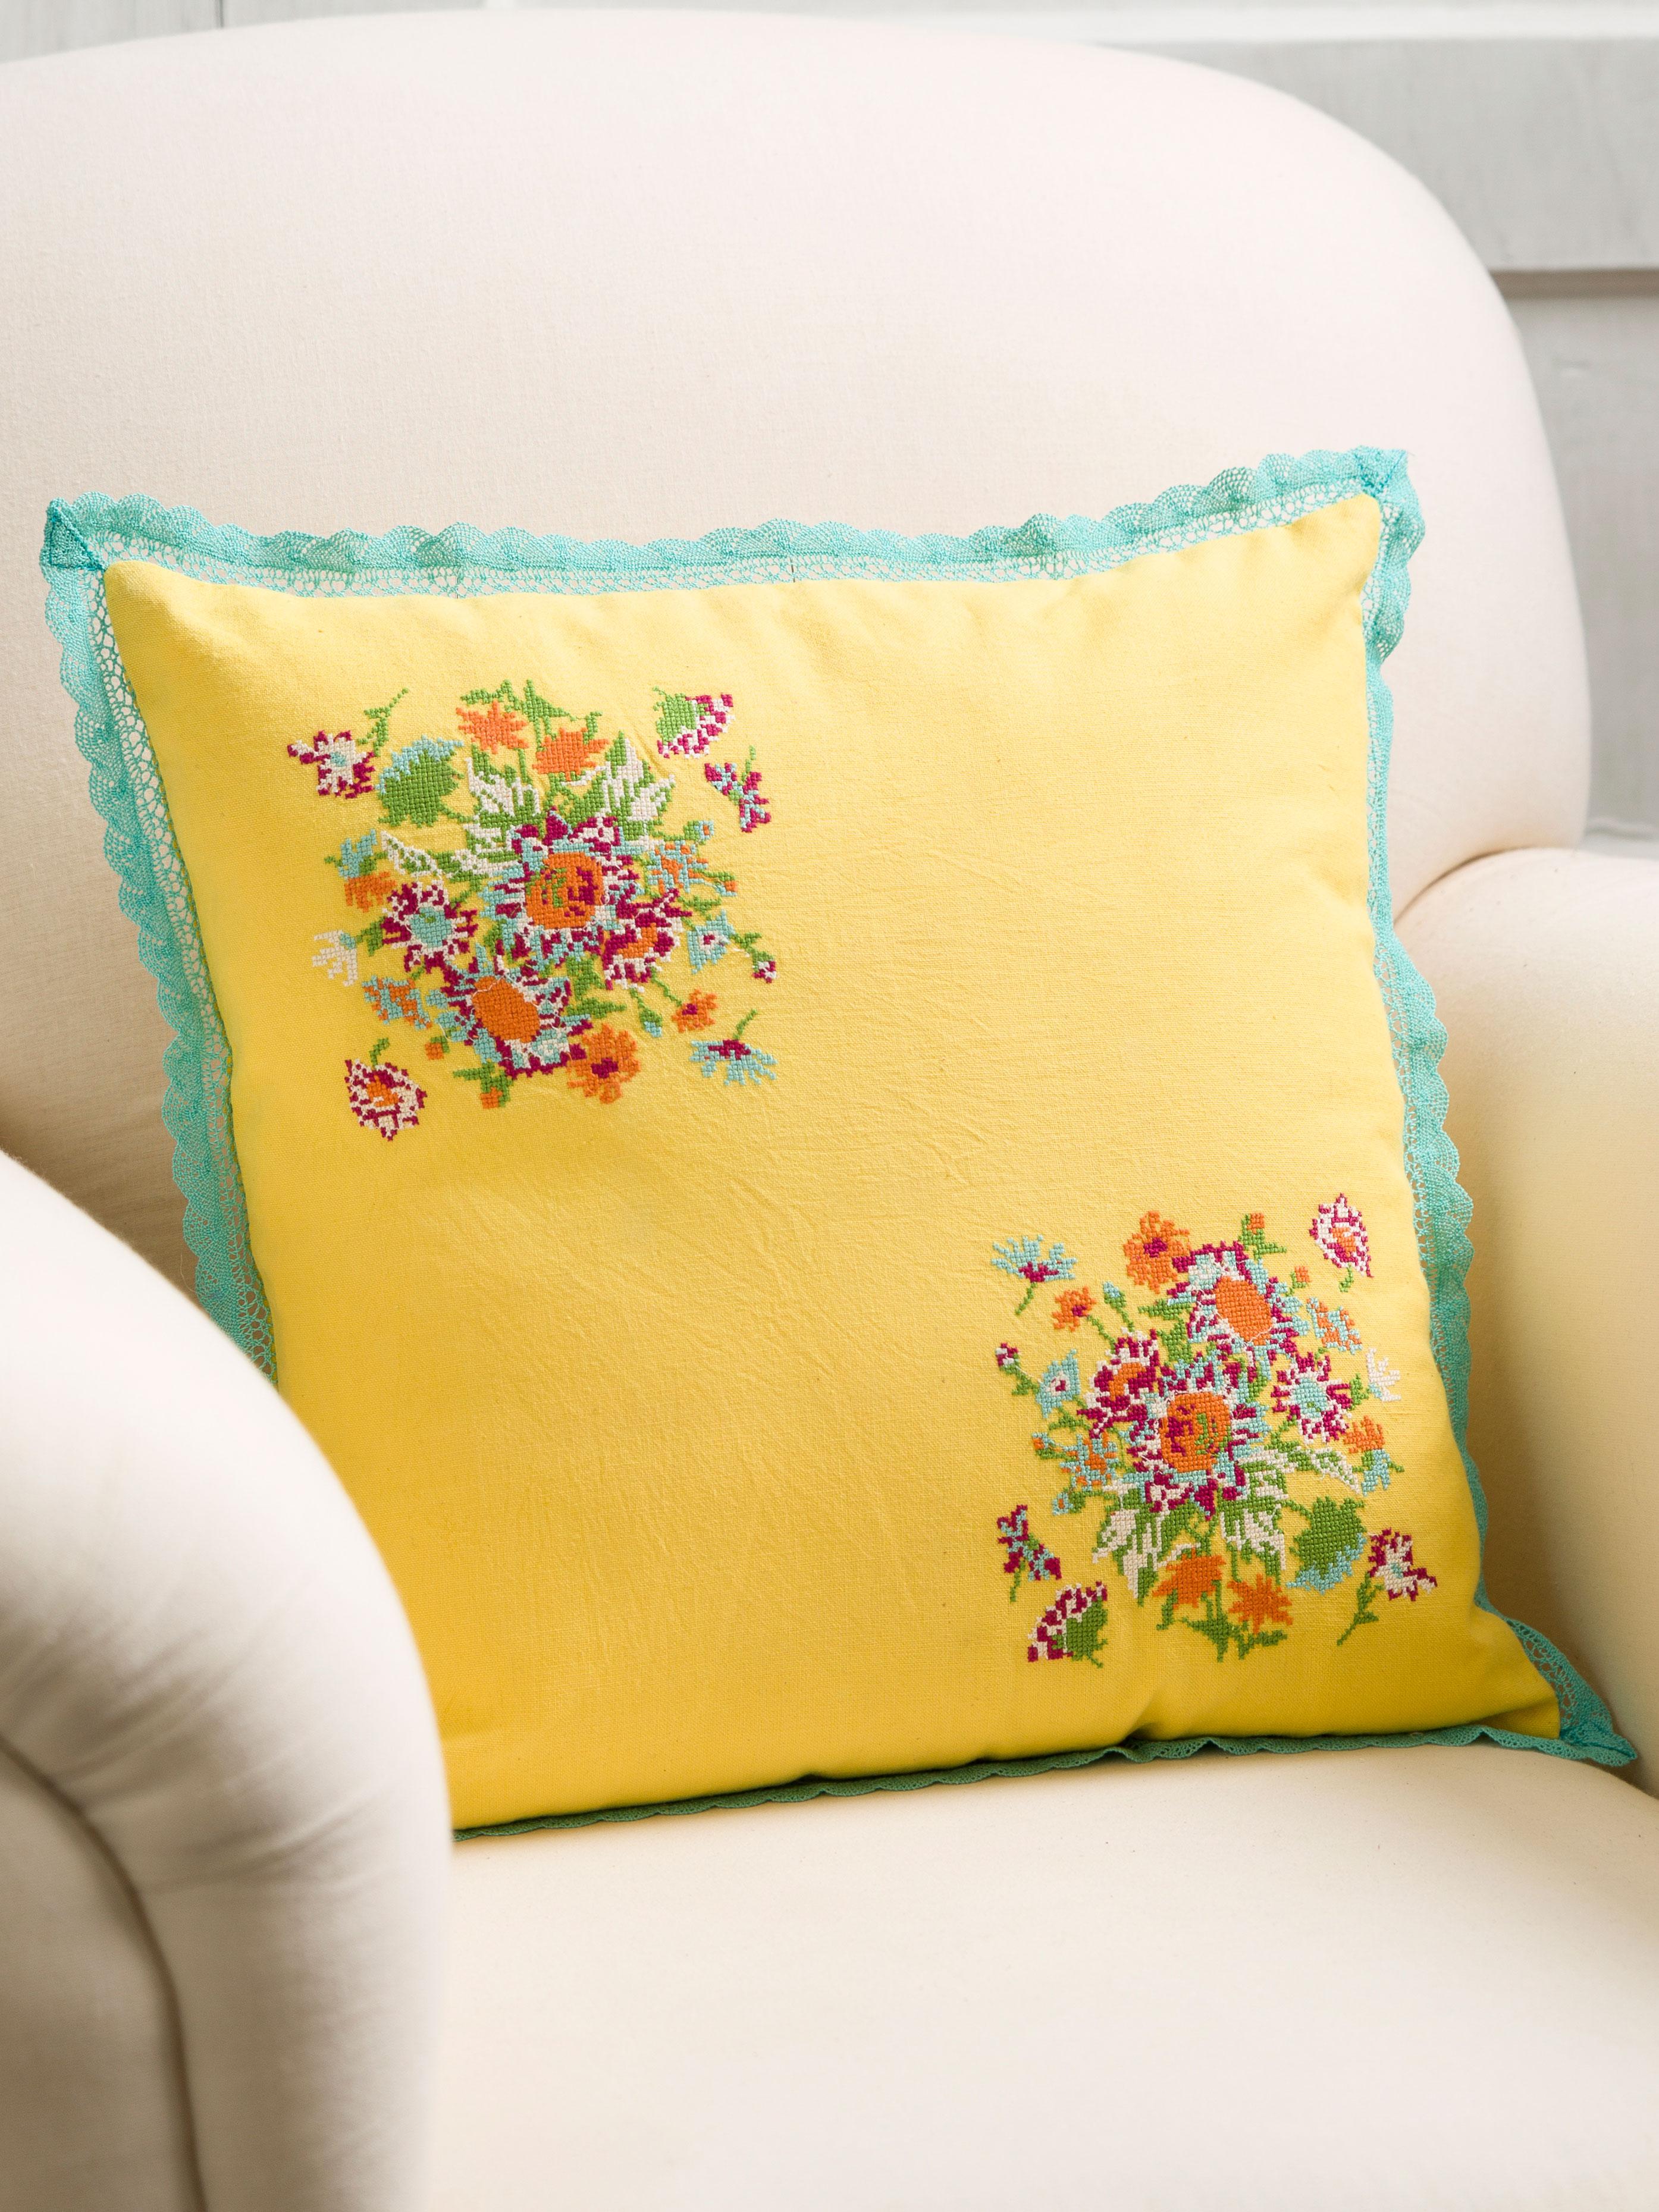 Senorita Emb Cushion Attic Sale Your Home Attic